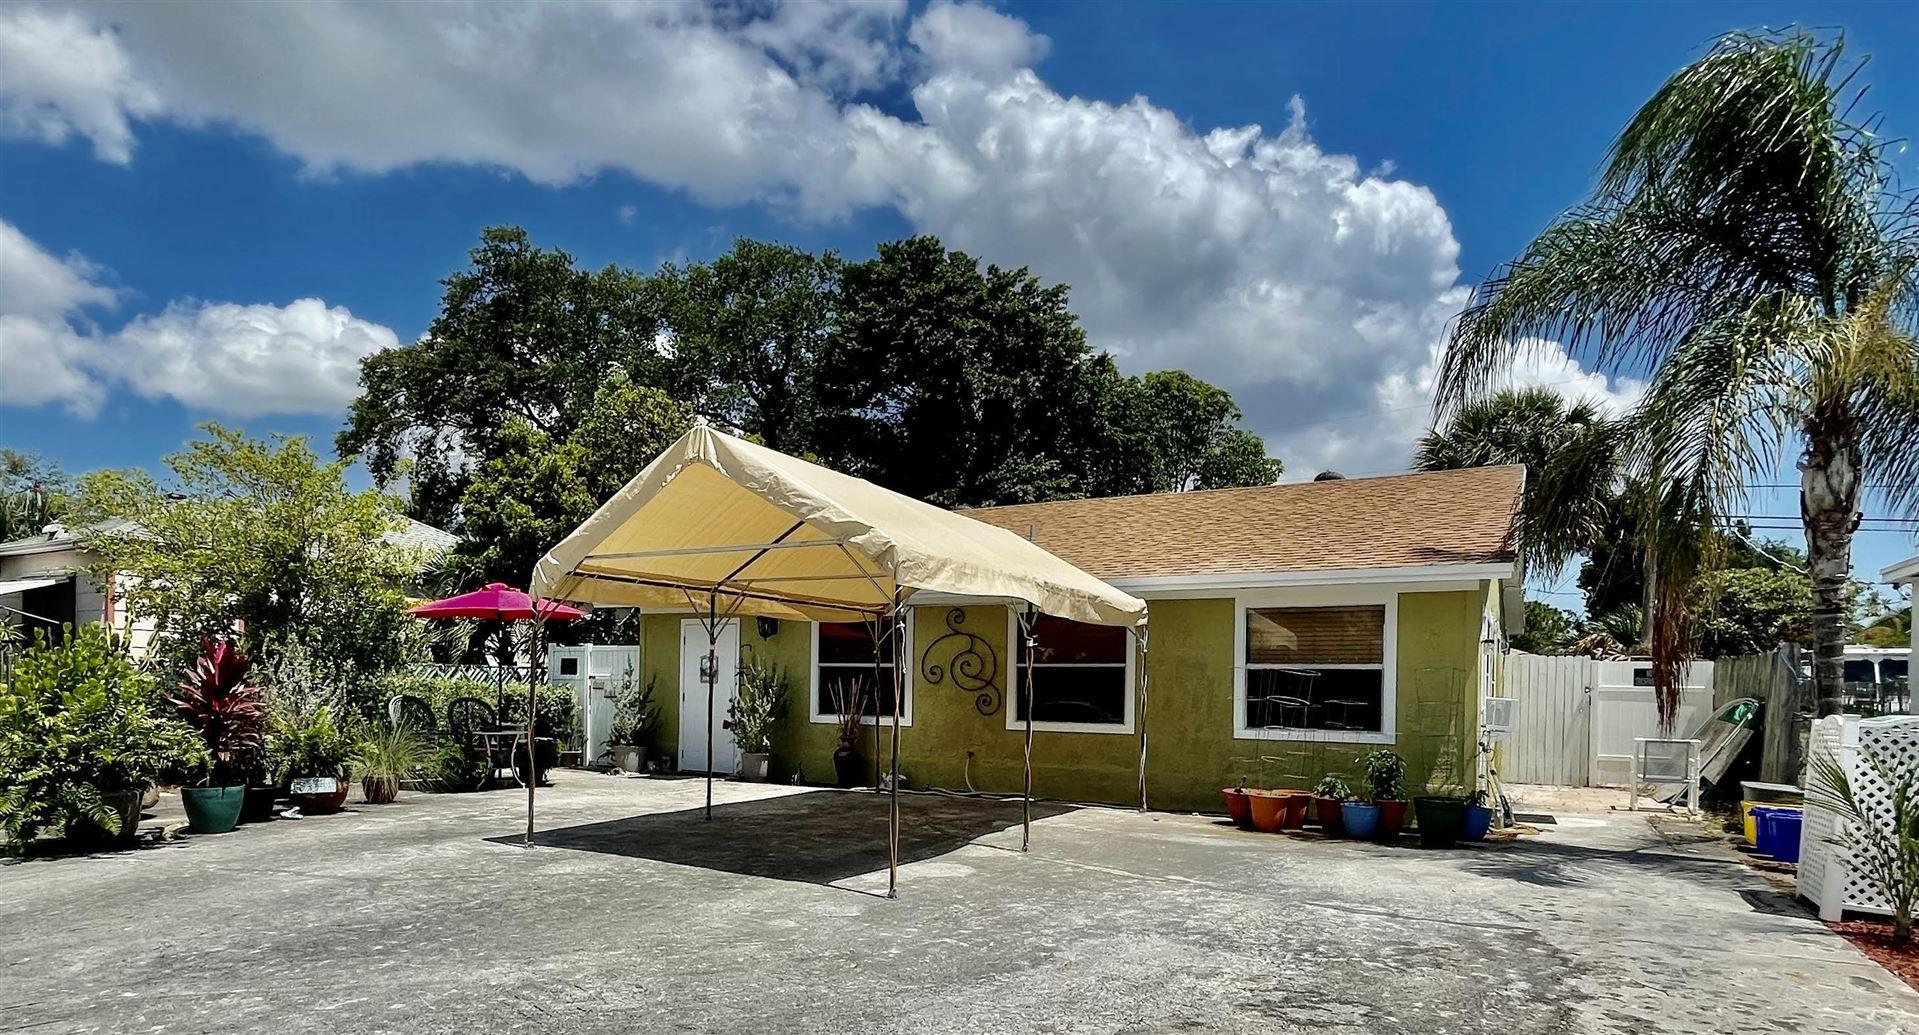 122 E 22nd Court, Riviera Beach, FL 33404 - MLS#: RX-10720817